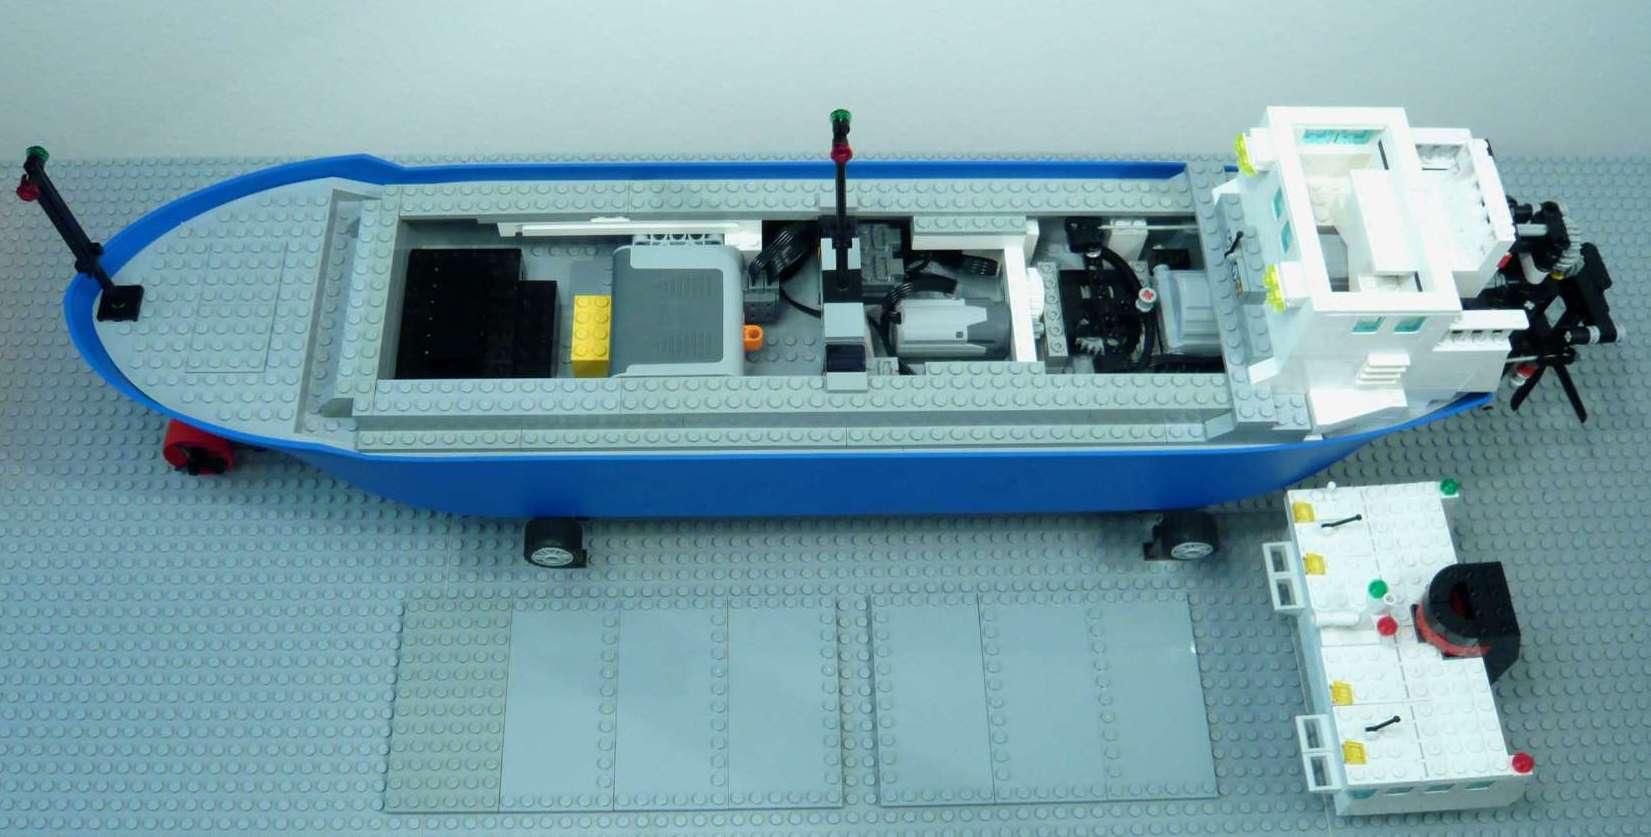 1c_lego_containership.jpg